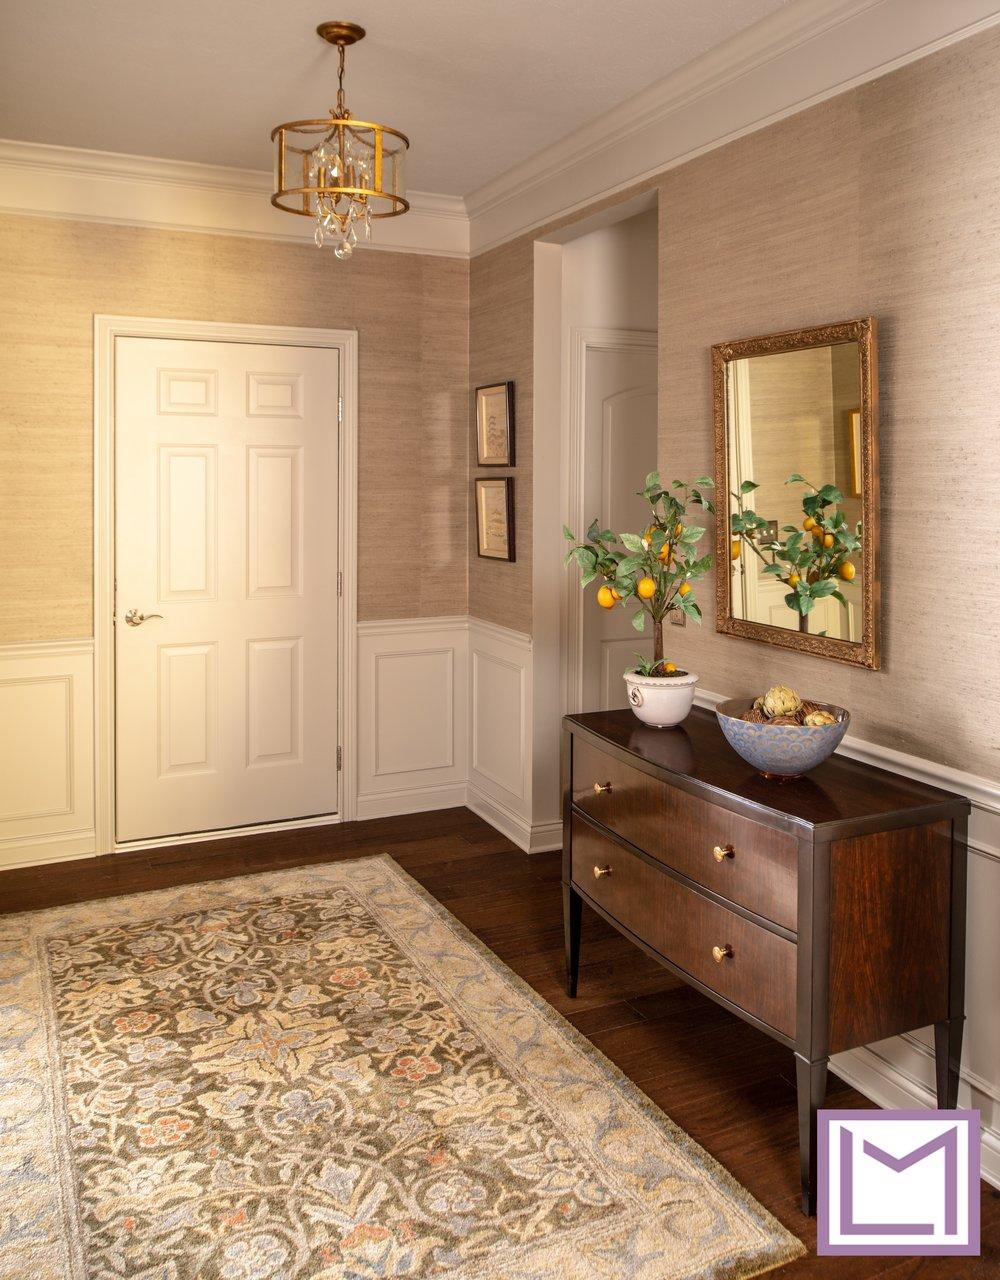 G_Foyer - Watermark.jpg